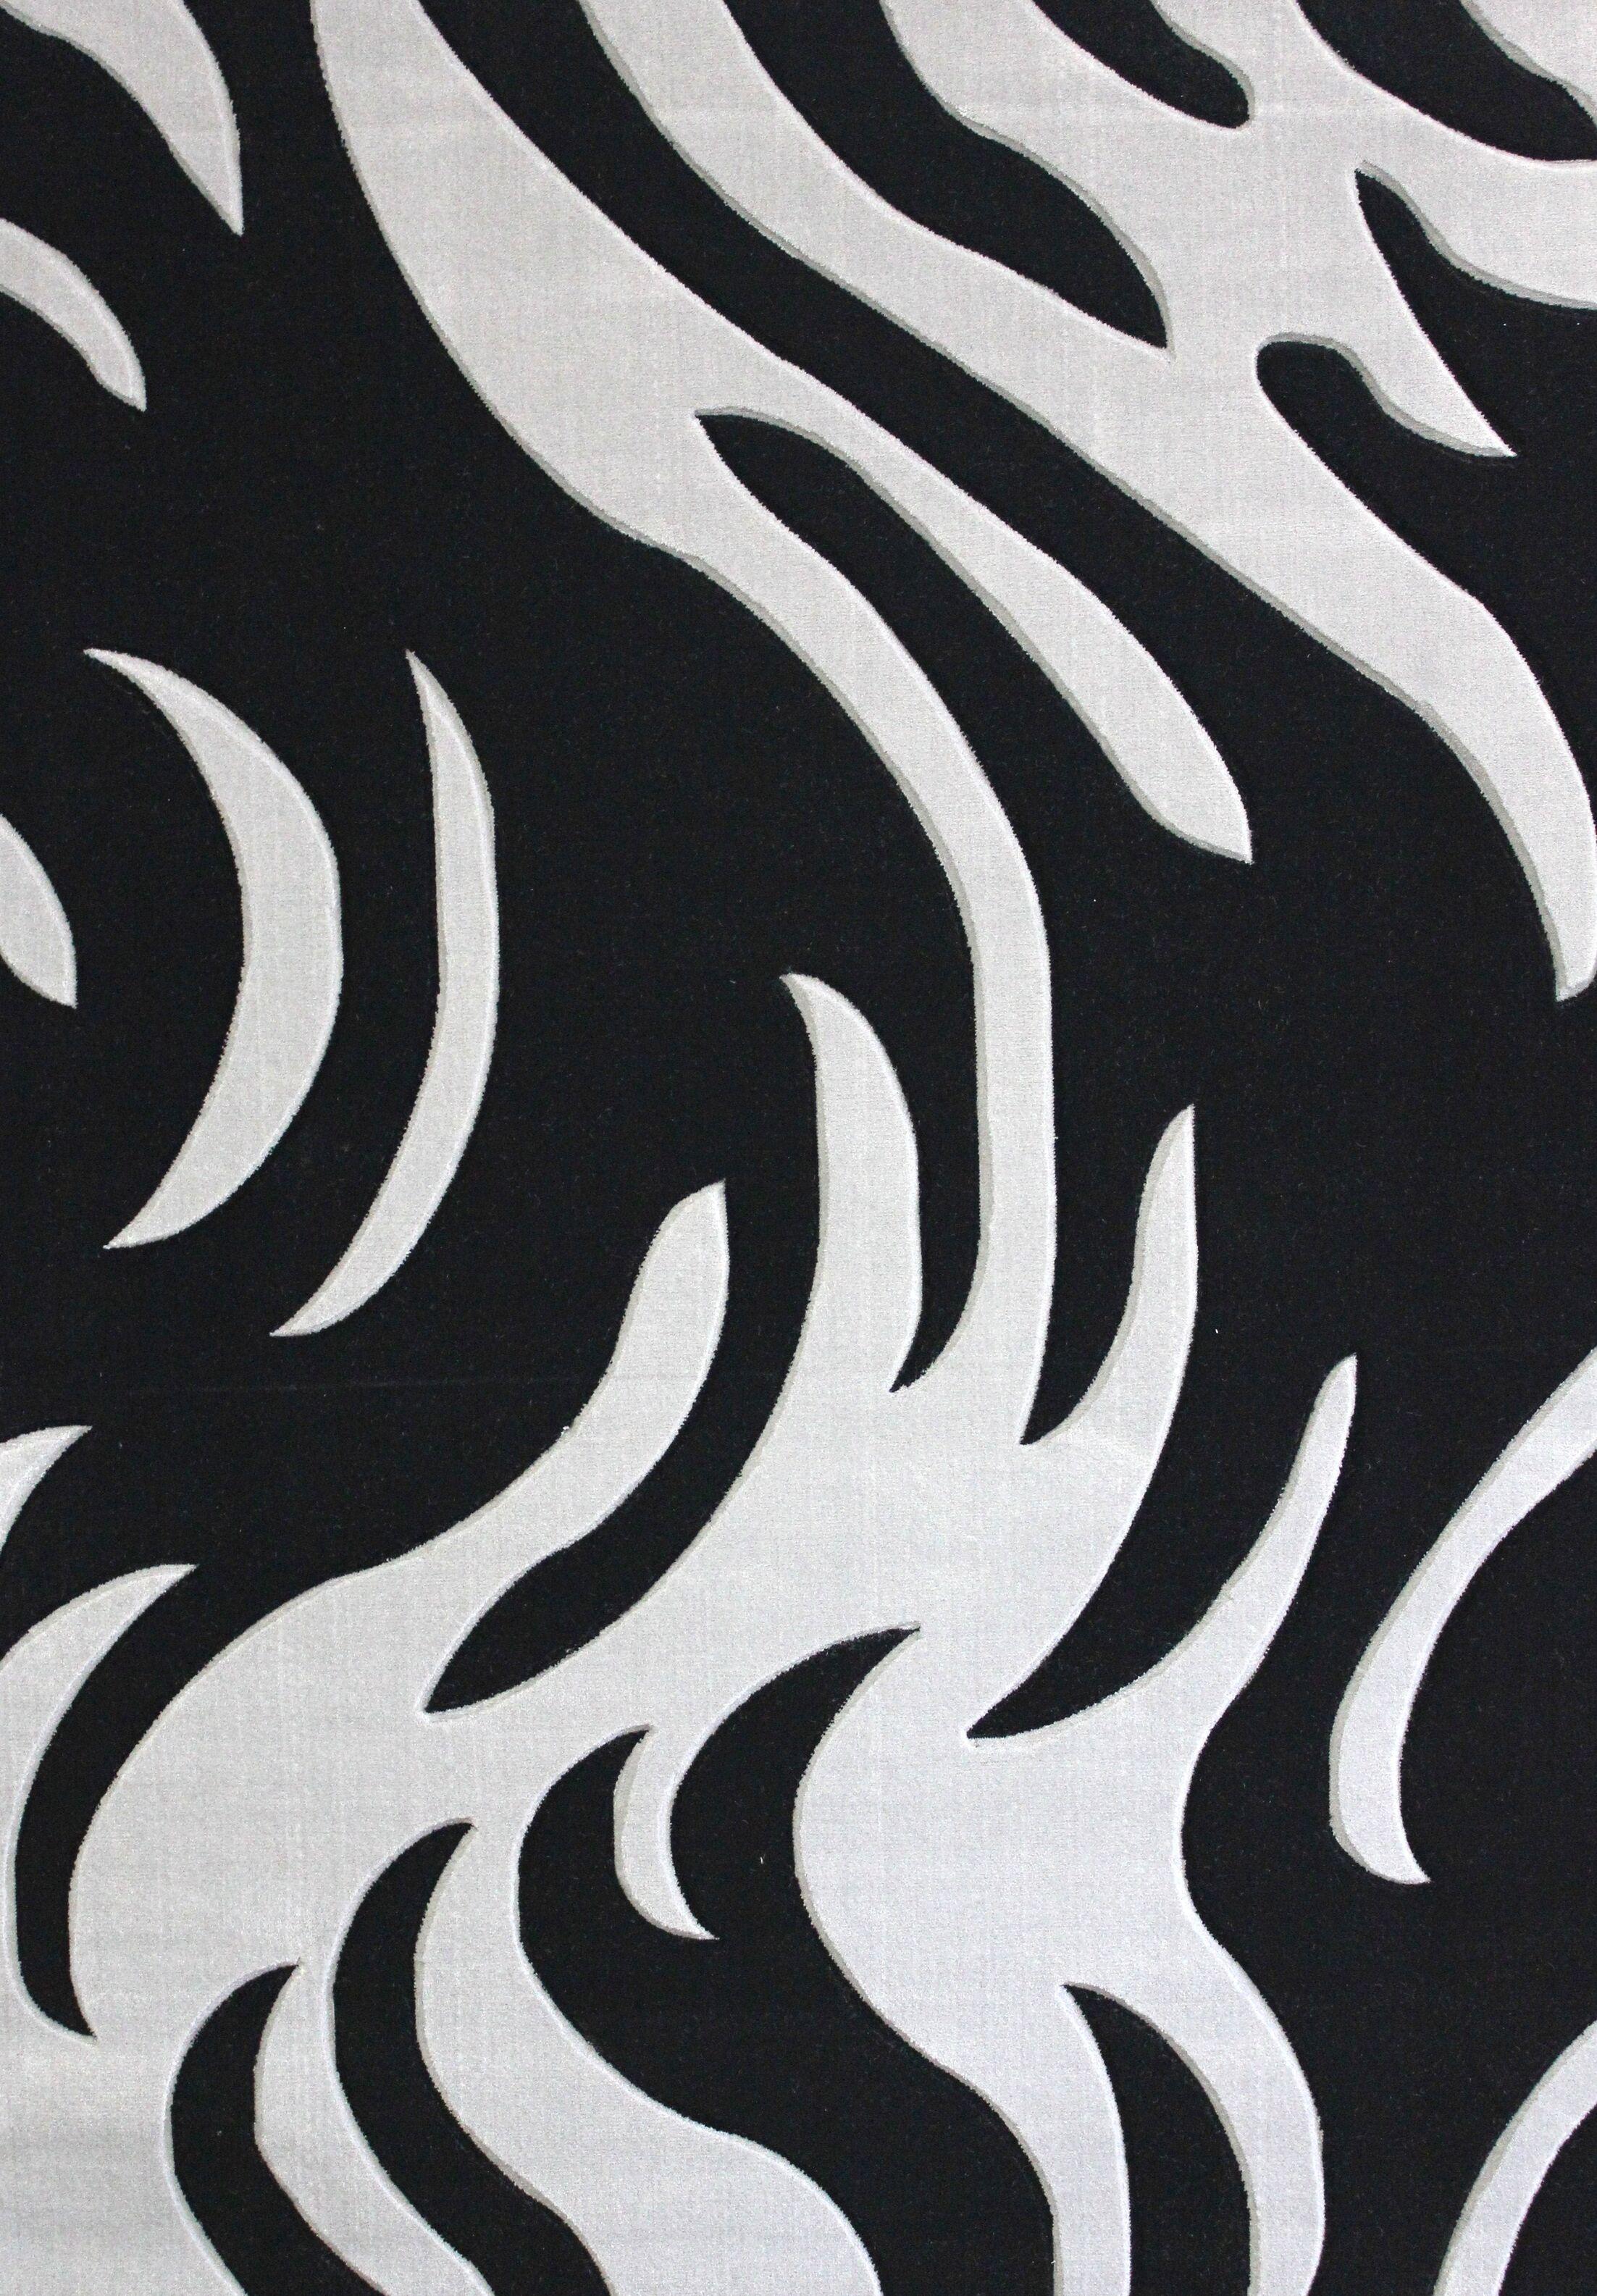 Geo Hand-Tufted Gray/Black Area Rug